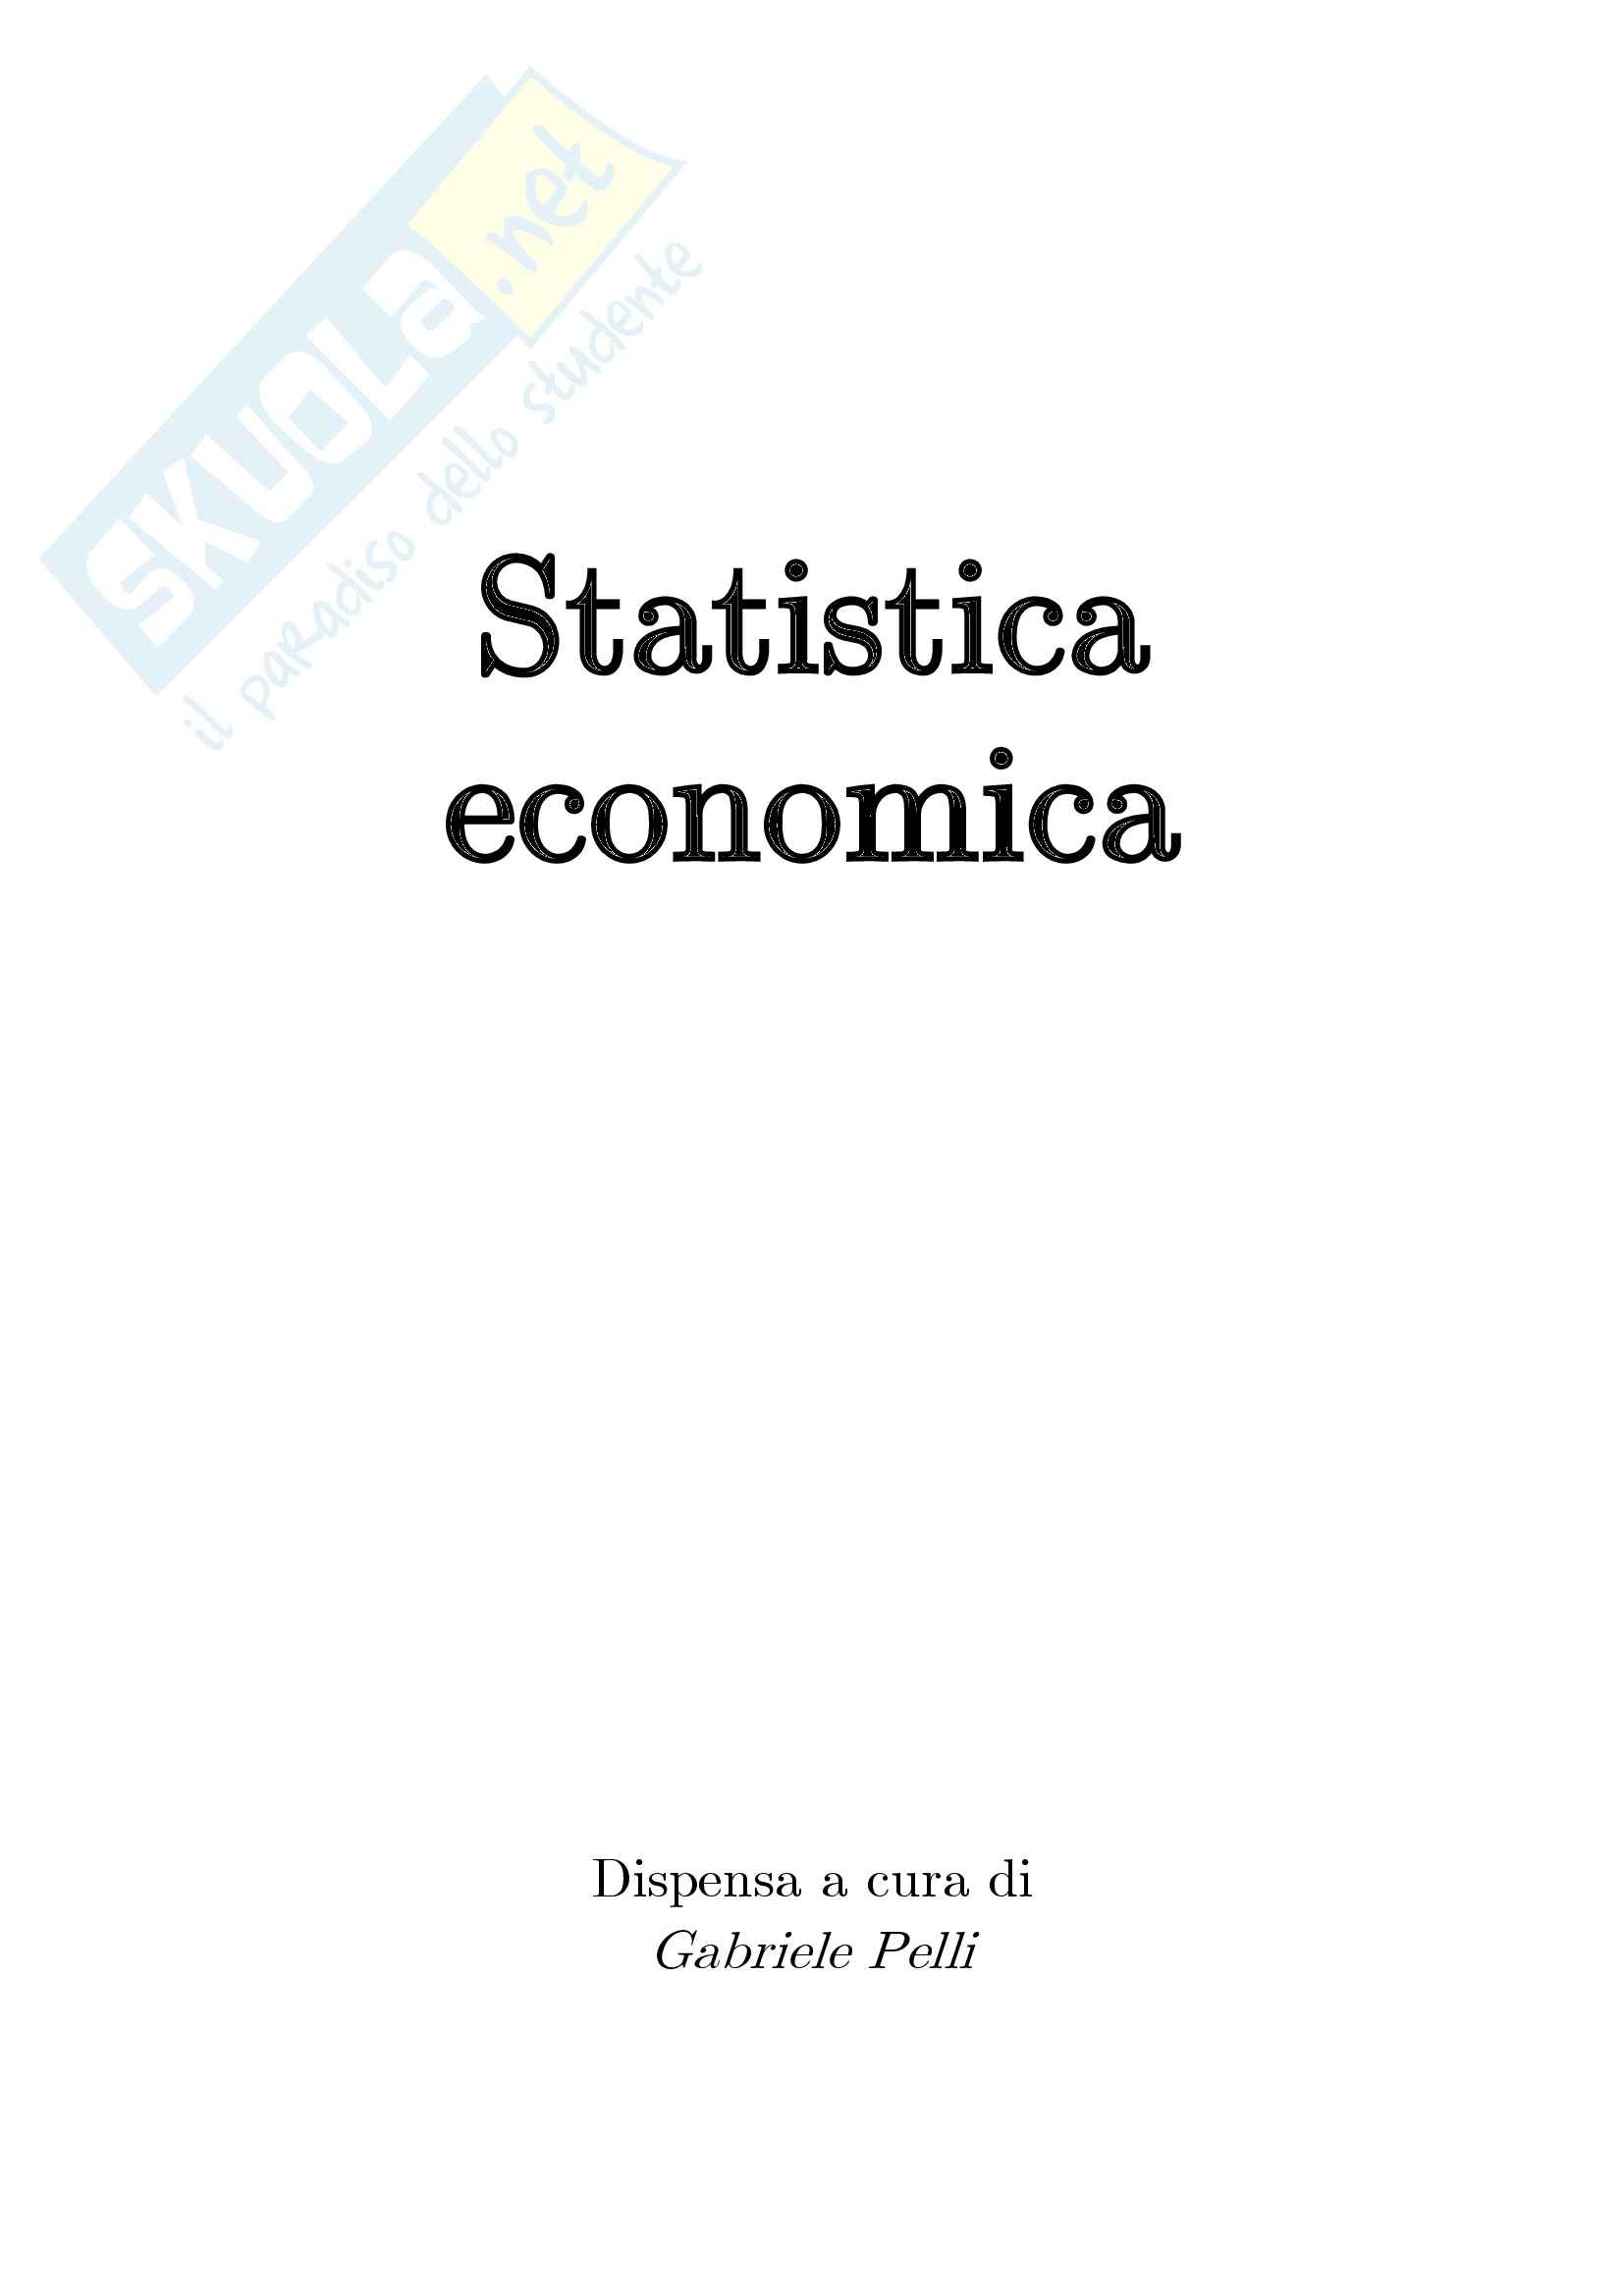 appunto A. Dacomo Statistica economica